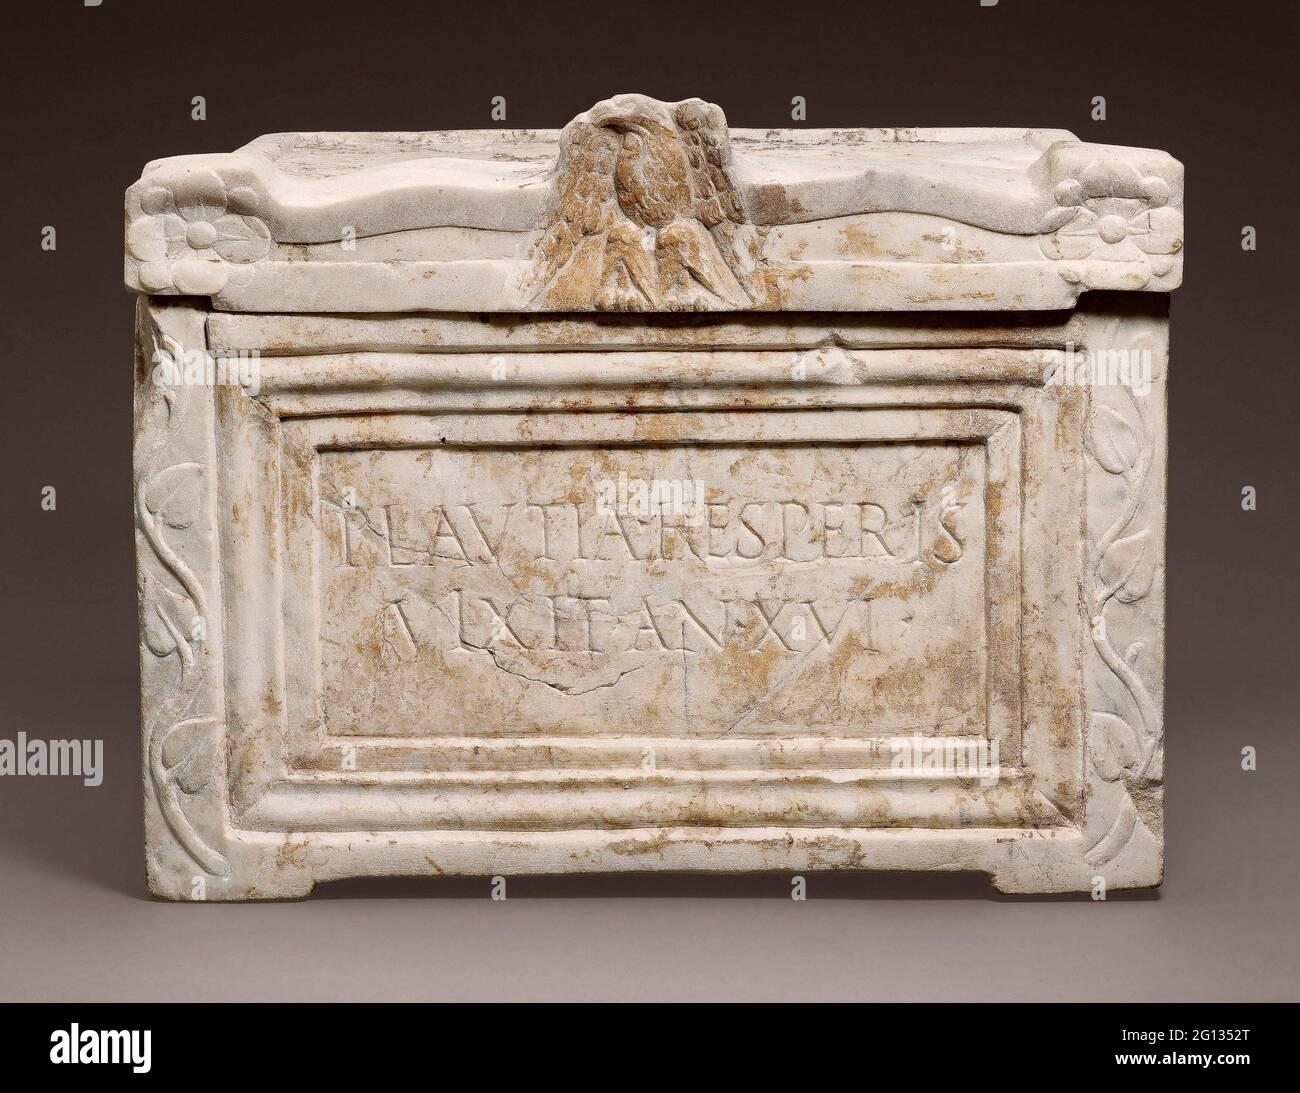 Auteur: Ancien romain. Ccinerary Urn de Platia Hesperis - 1er siècle AD - Roman. Marbre. 1 AD - 100 AD. Italie. Banque D'Images